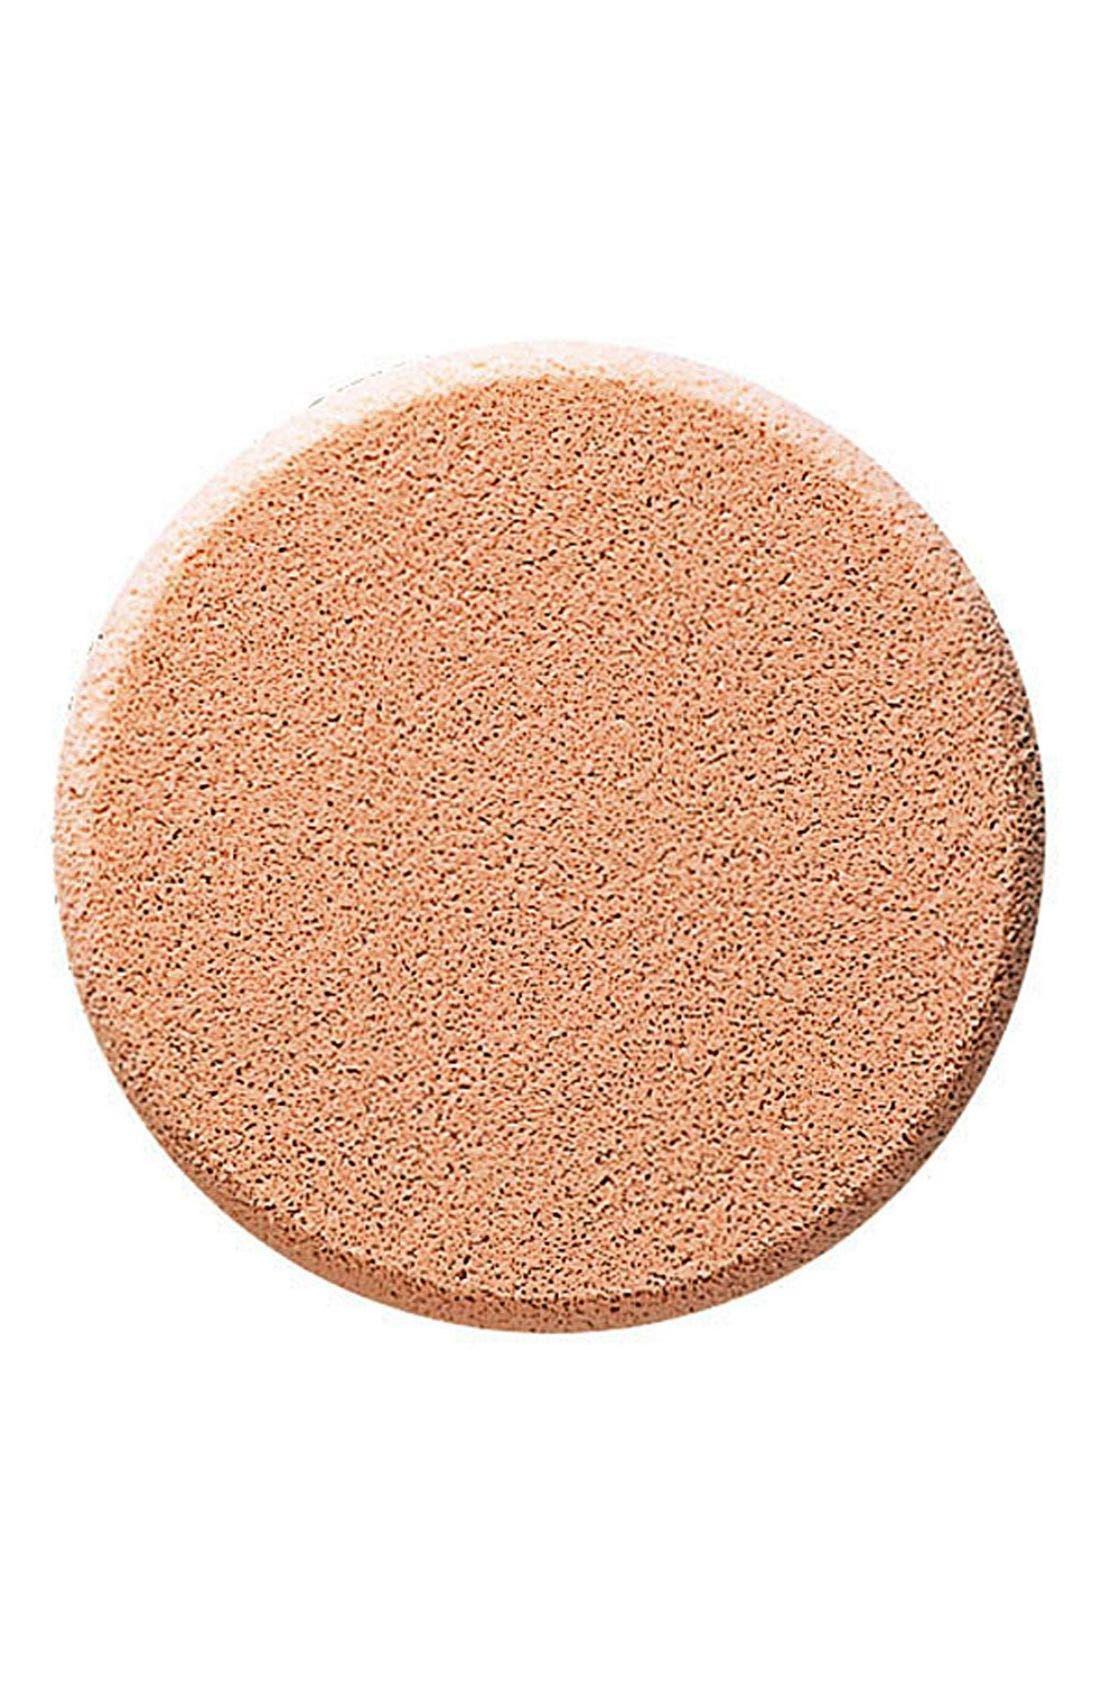 Shiseido 'The Makeup' Sponge Puff for Foundation